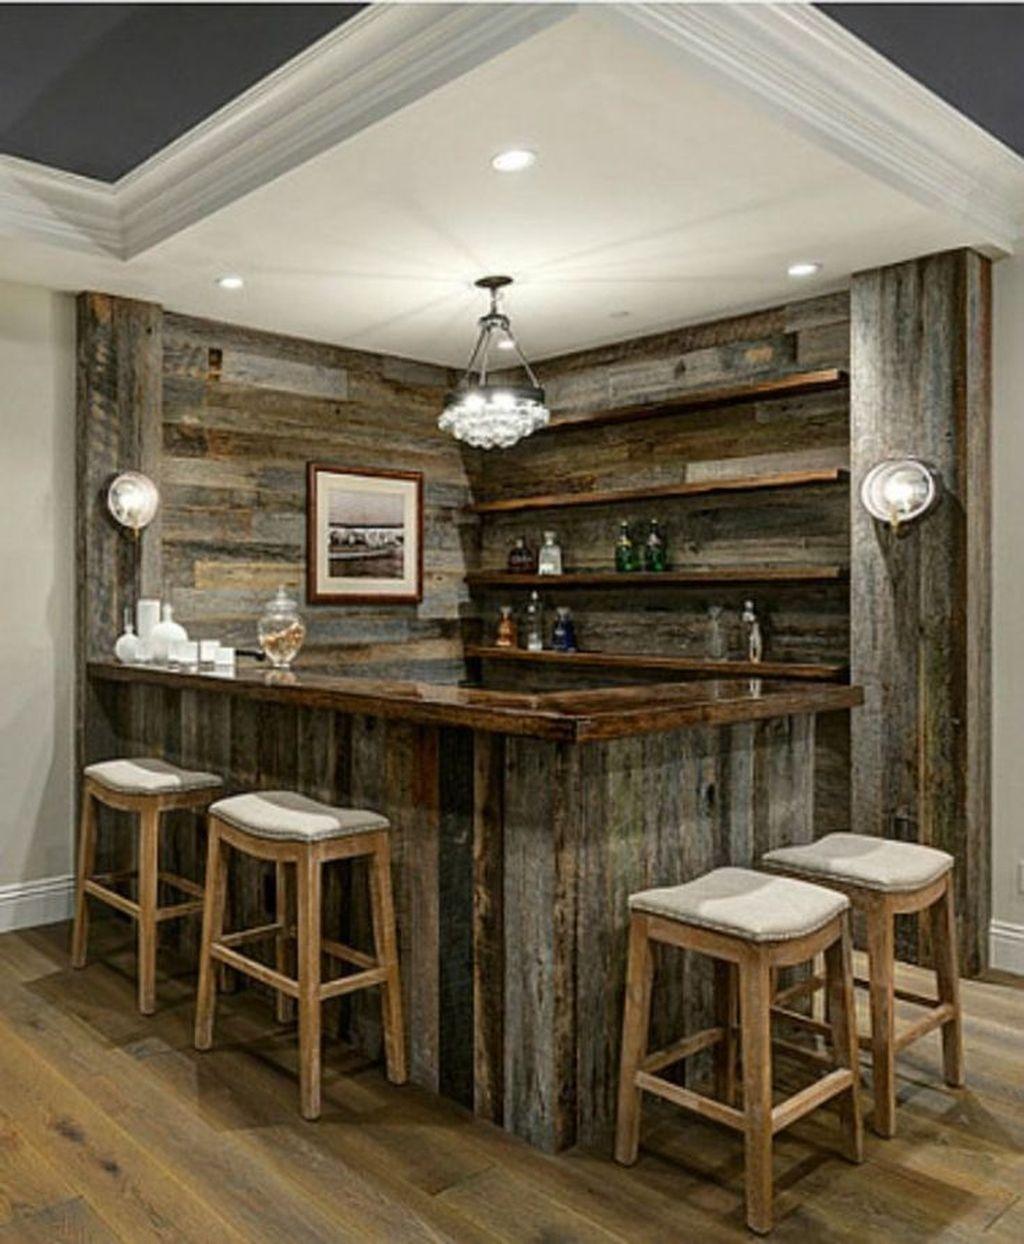 Popular Coffee Bar Ideas For Your Interior Design 27